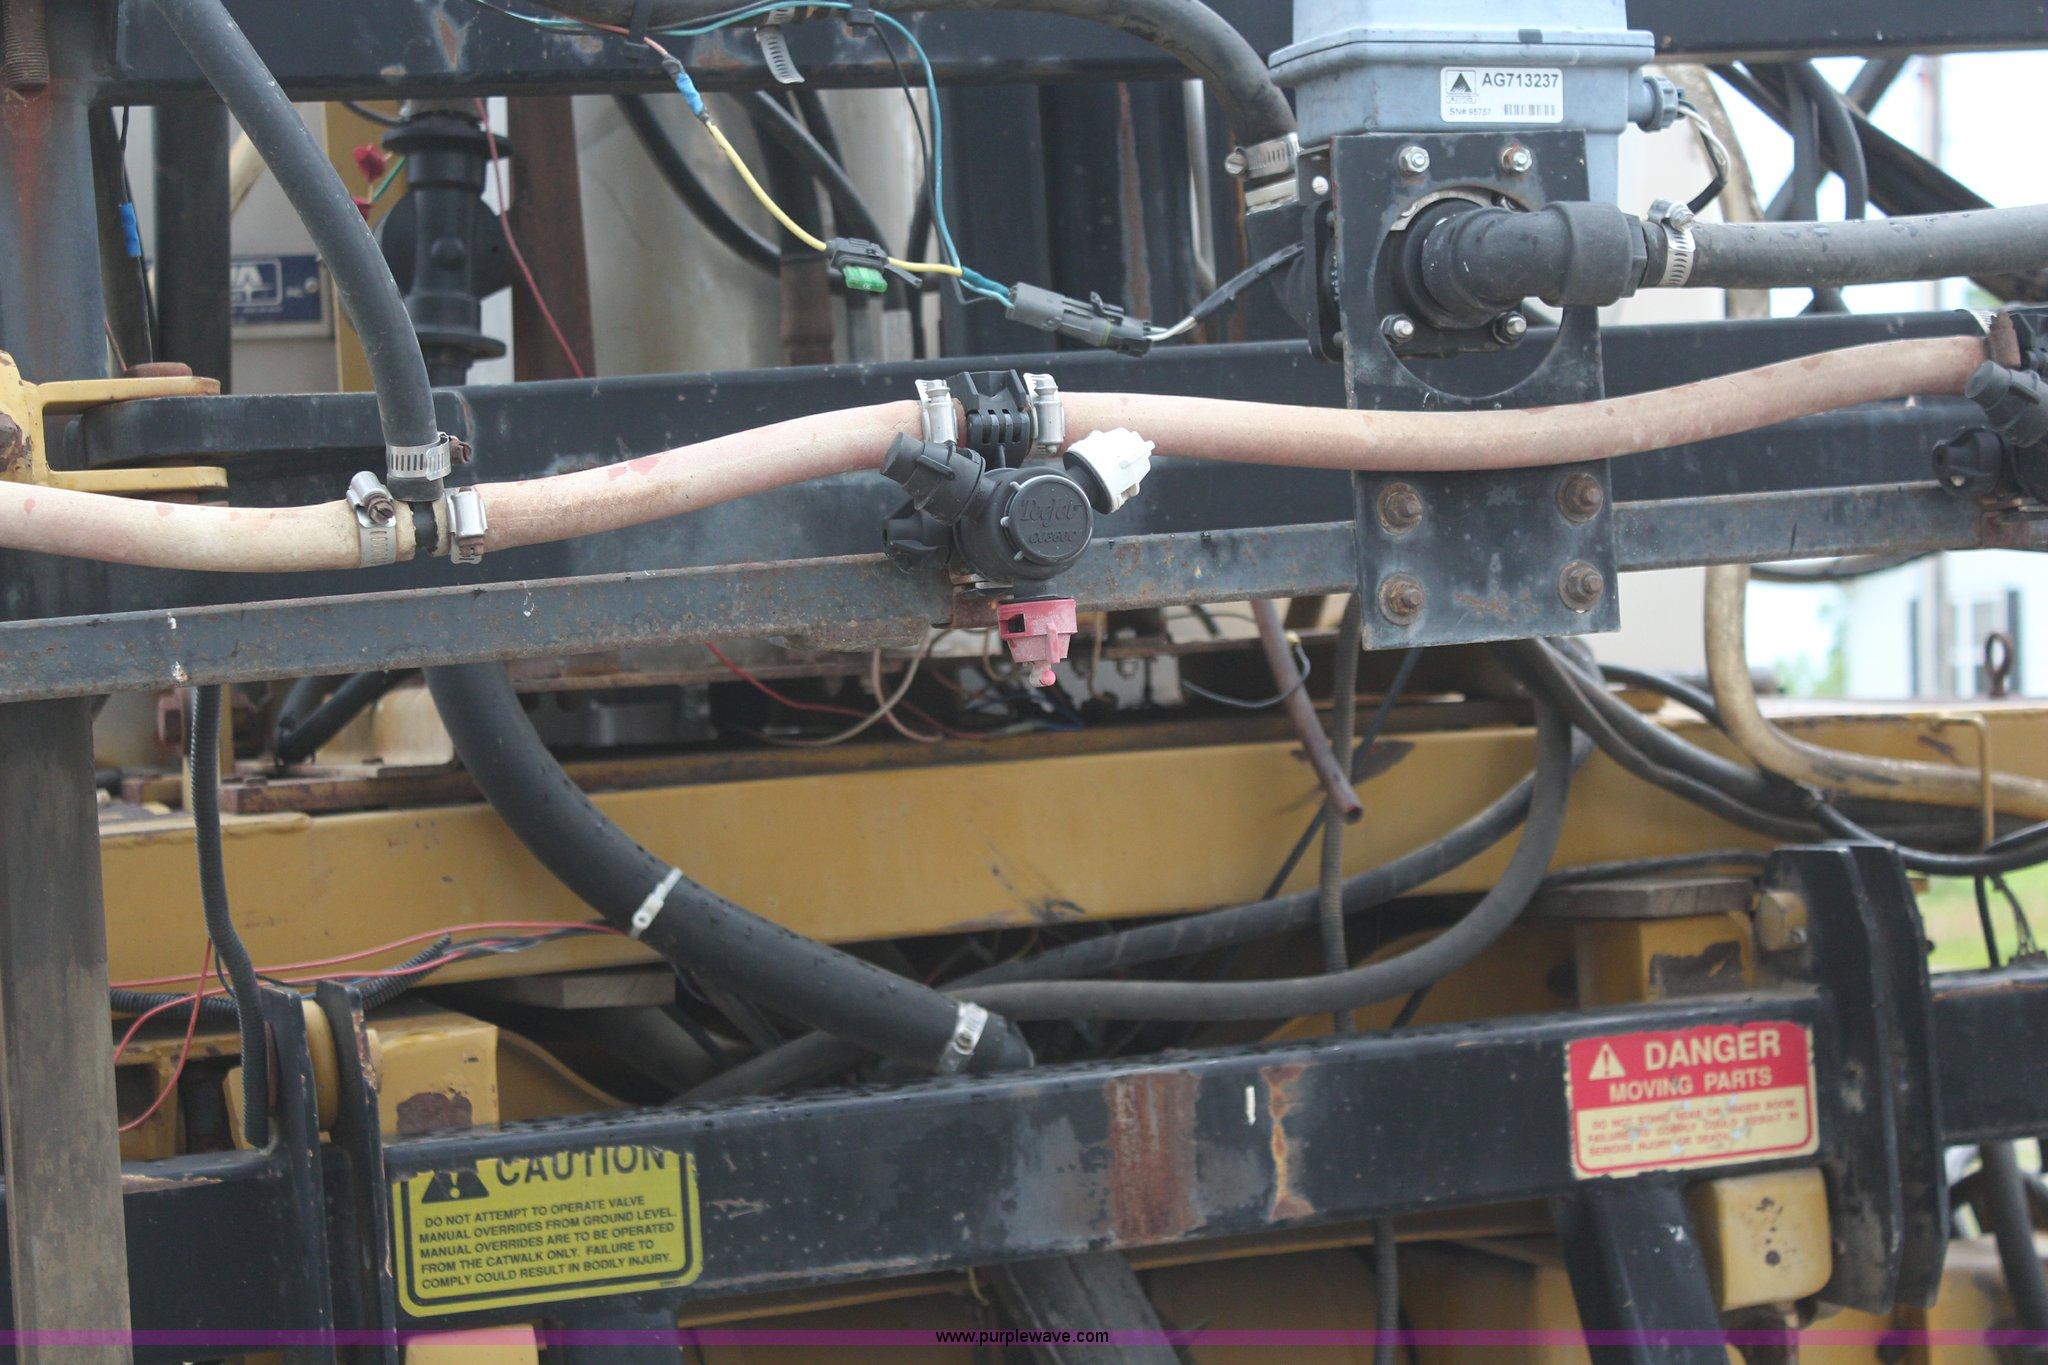 ... RoGator 664 self-propelled sprayer Full size in new window ...